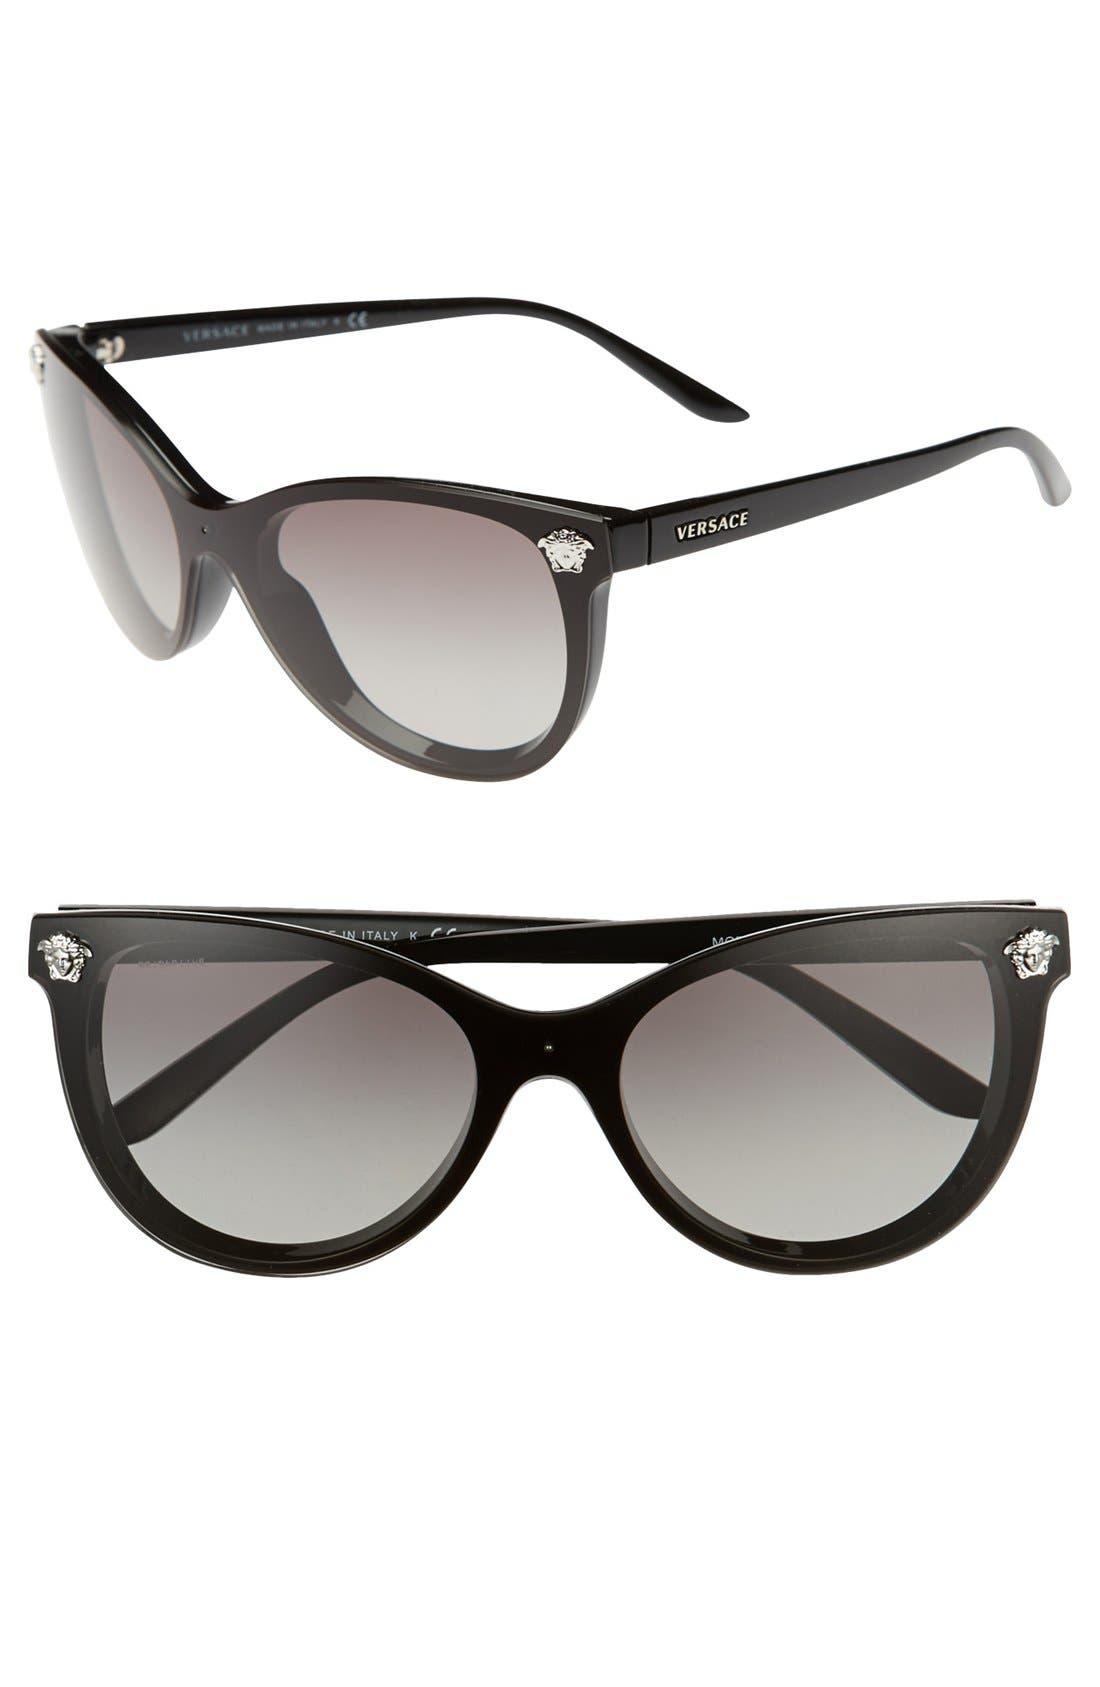 Alternate Image 1 Selected - Versace 'Rock Icons' 57mm Cat Eye Sunglasses